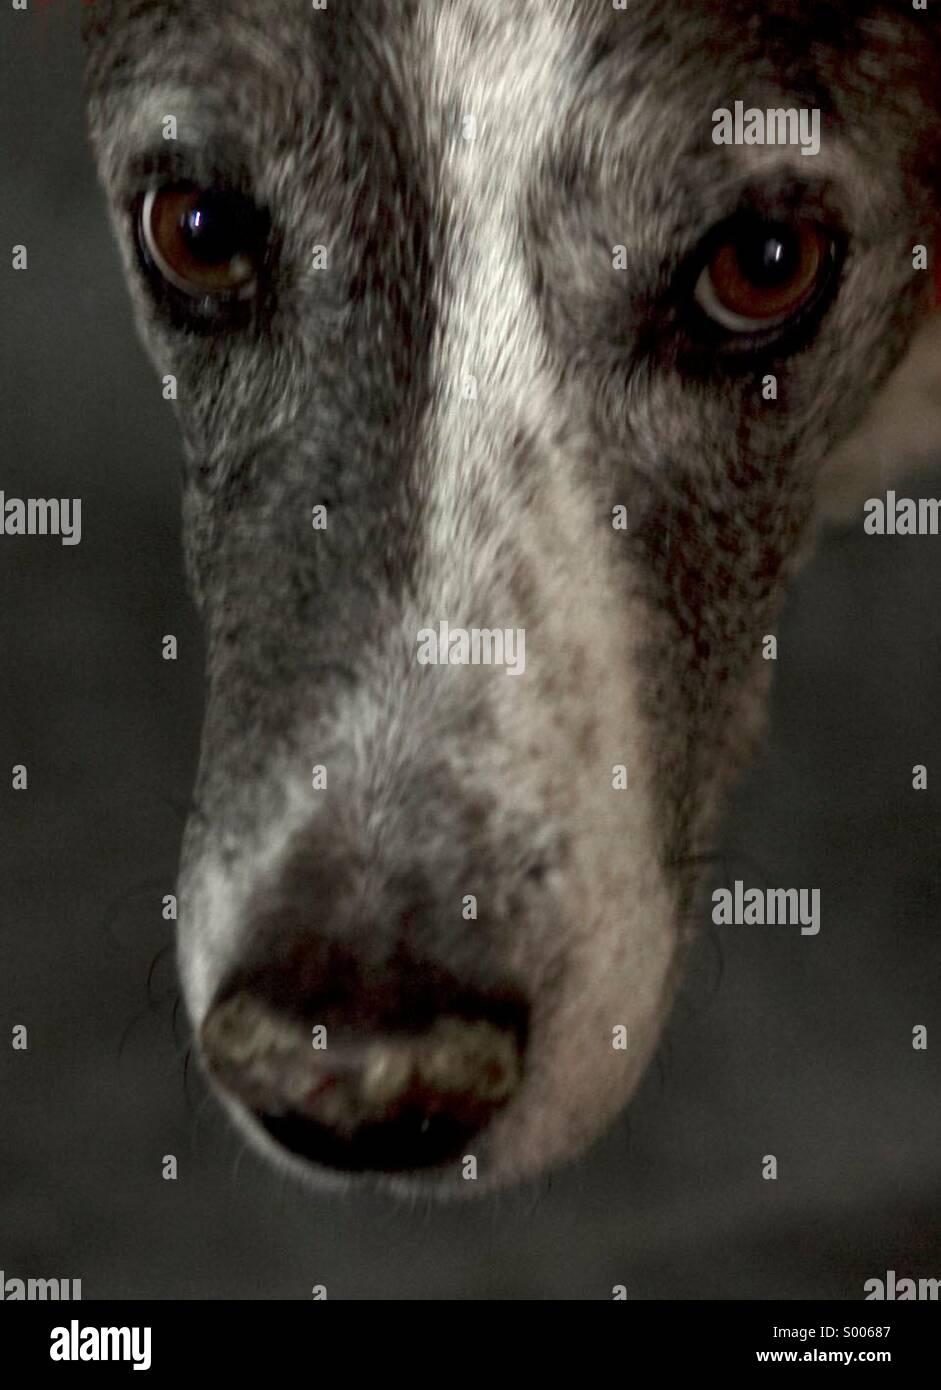 Catahoula, chien, race, le visage, Looking at Camera, animal, Animal, domestiquée, yeux, Close-up, pas de personnes Photo Stock